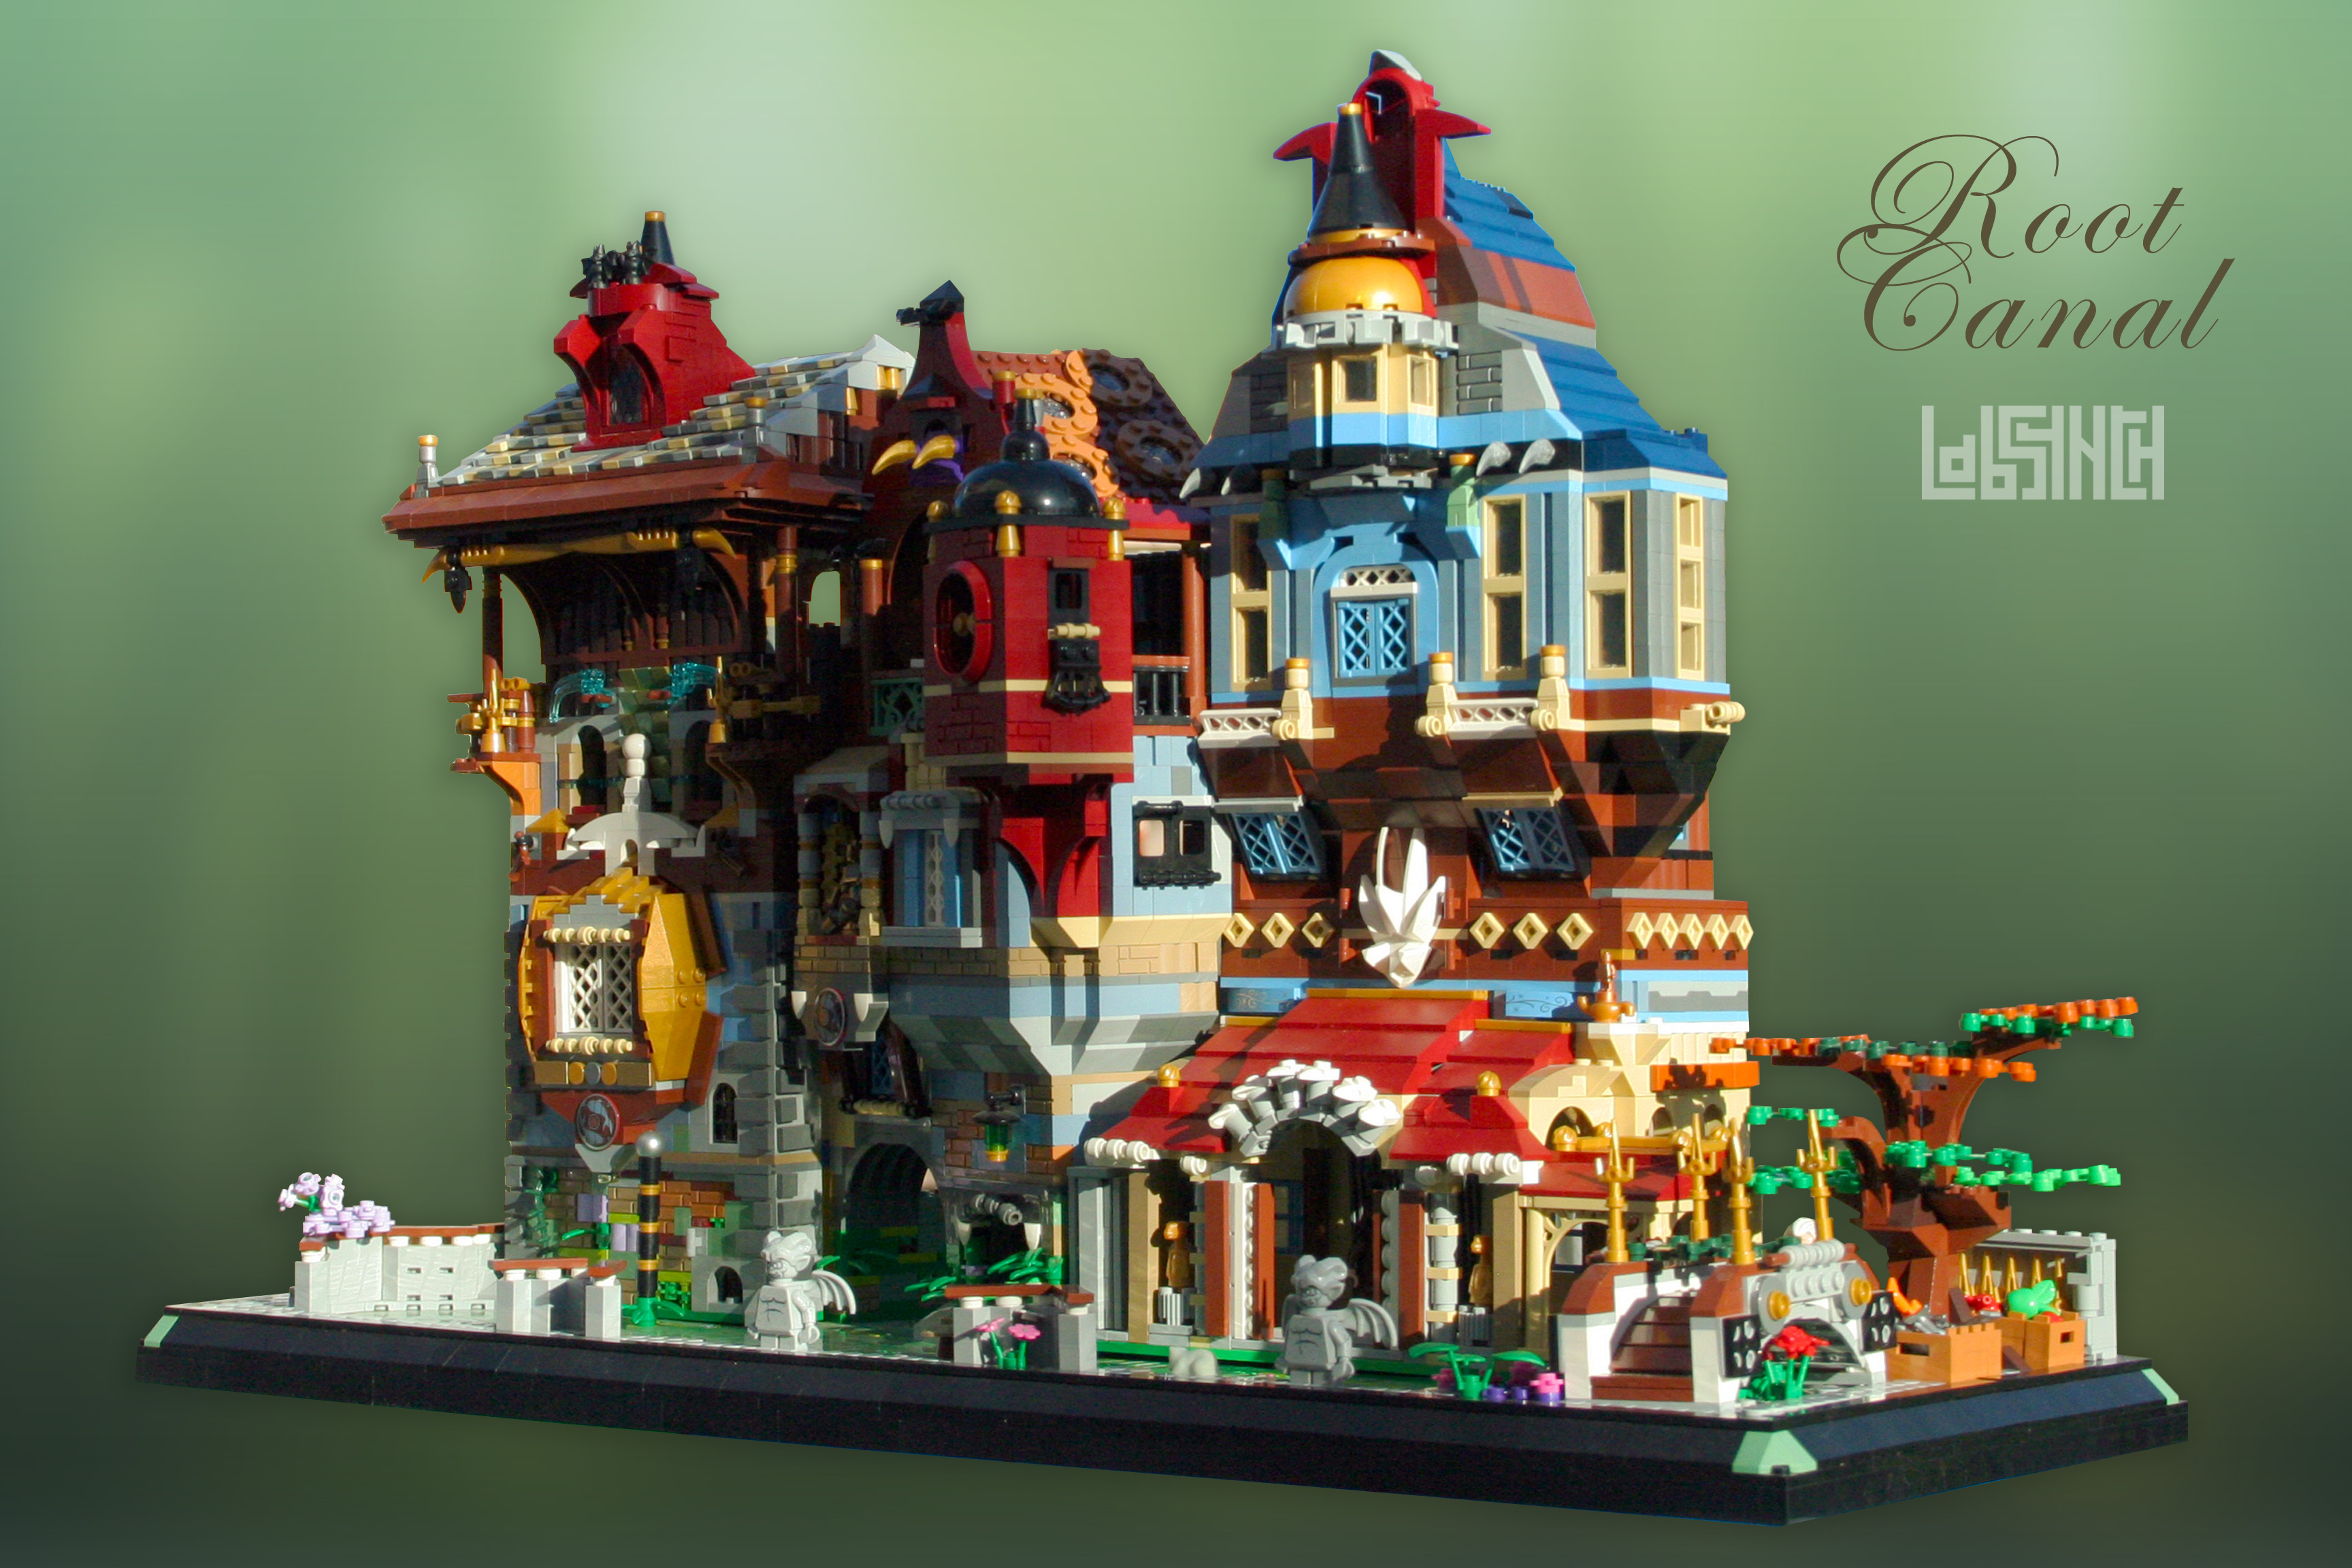 LEGO-MOC-RootCanal-01